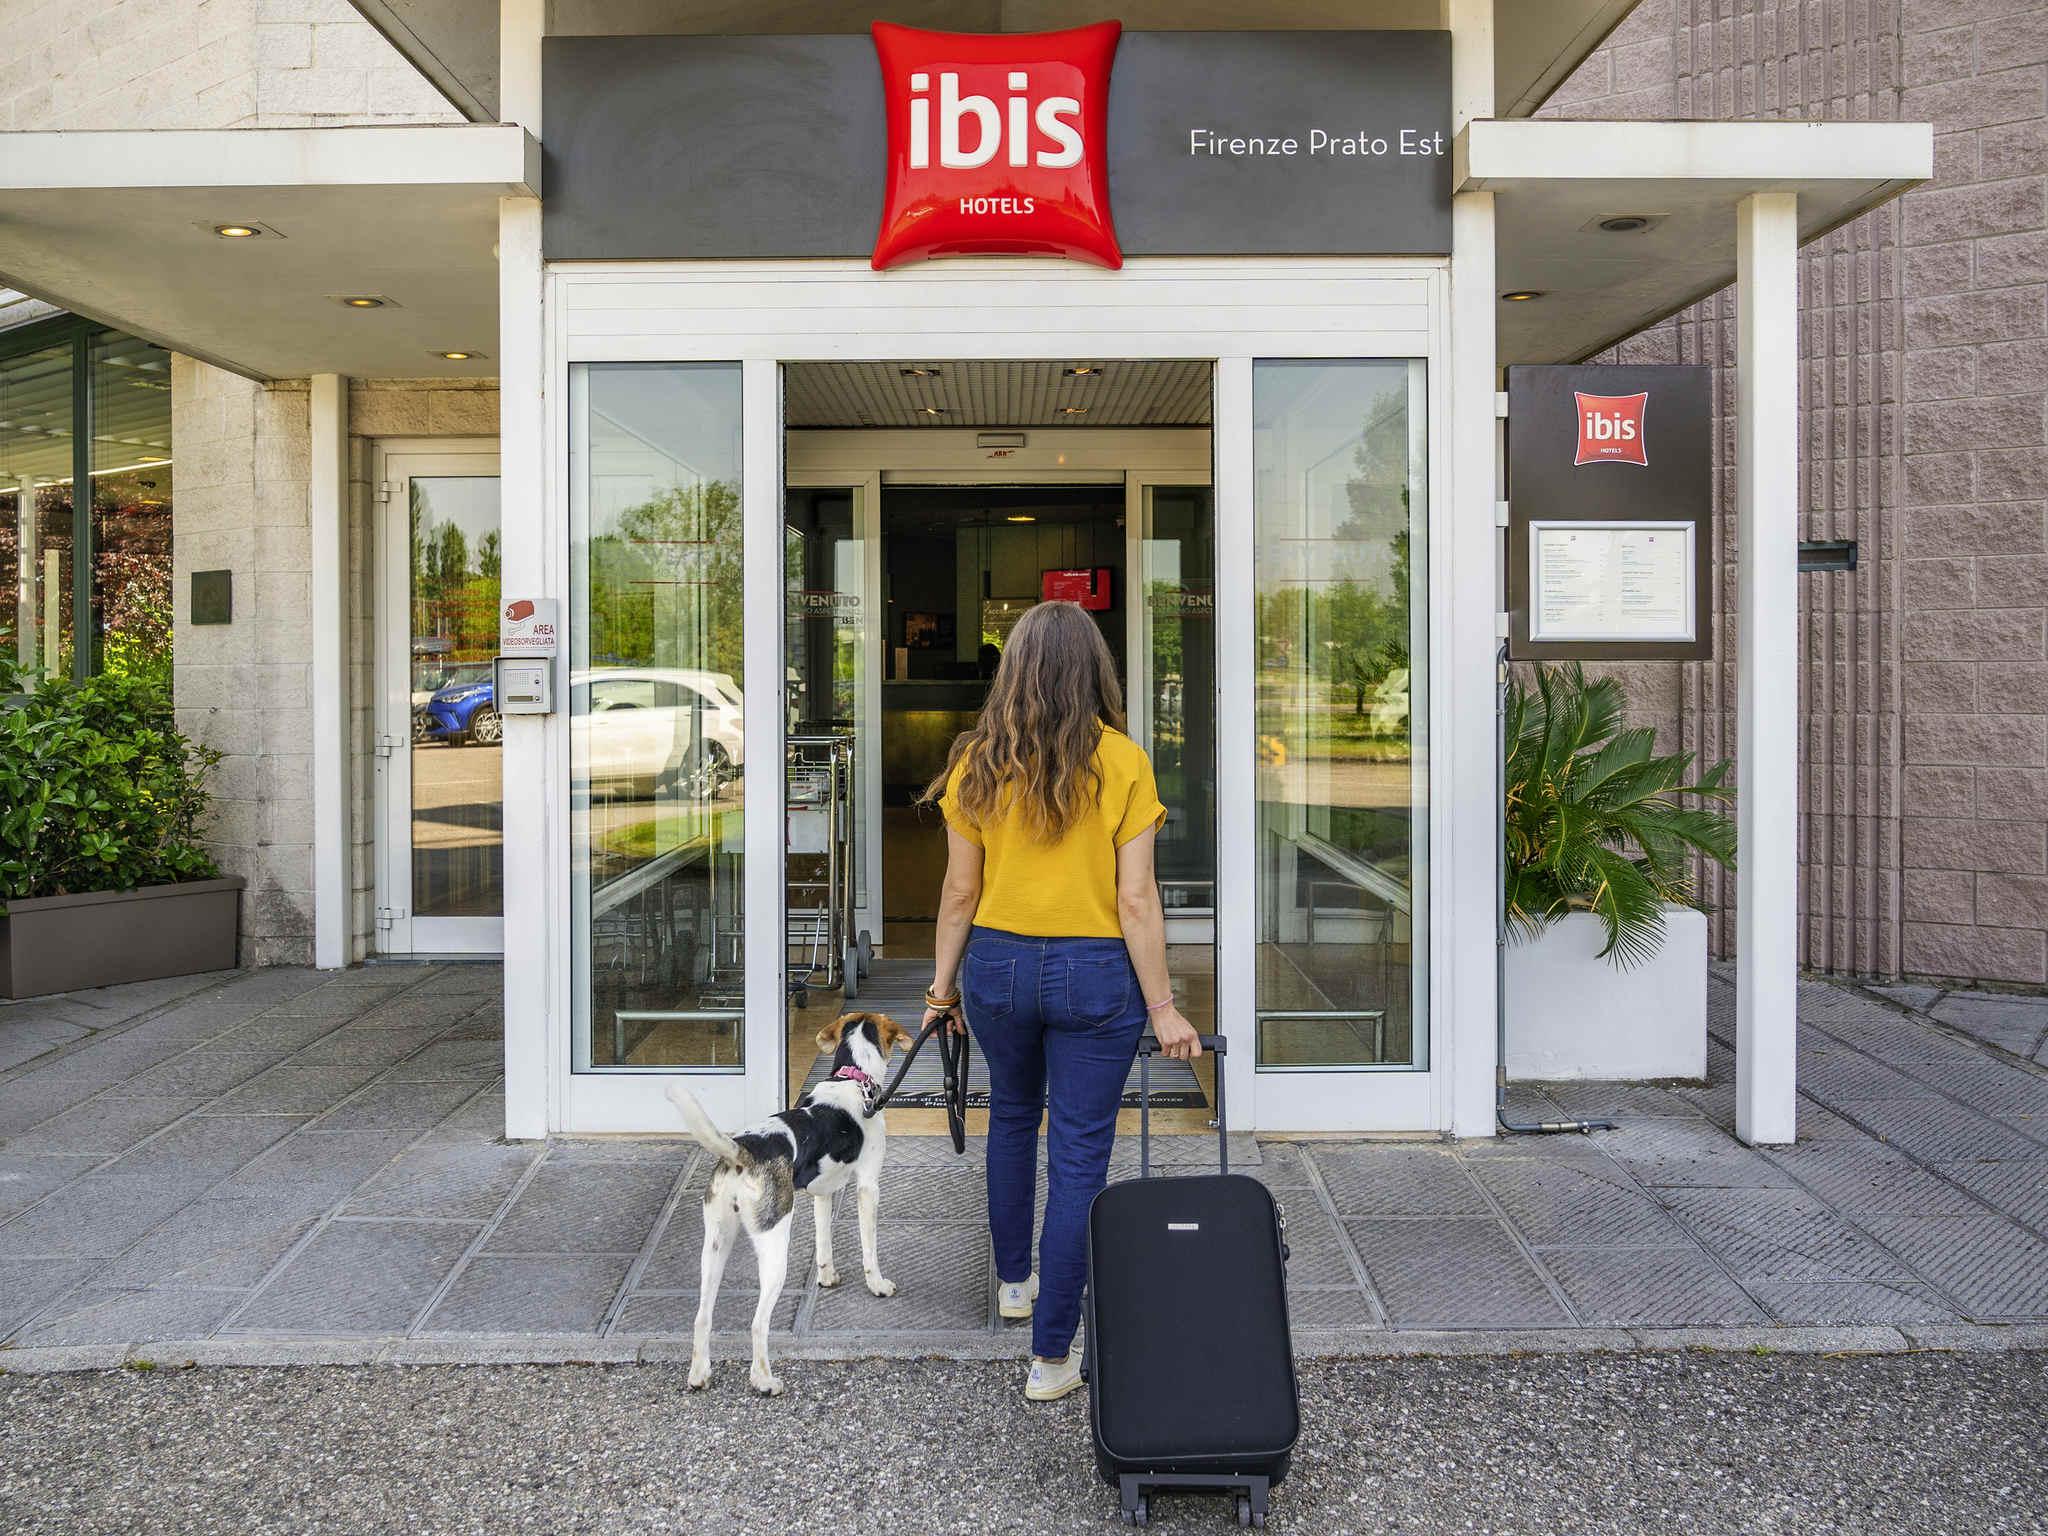 Ibis florence prato est hotel